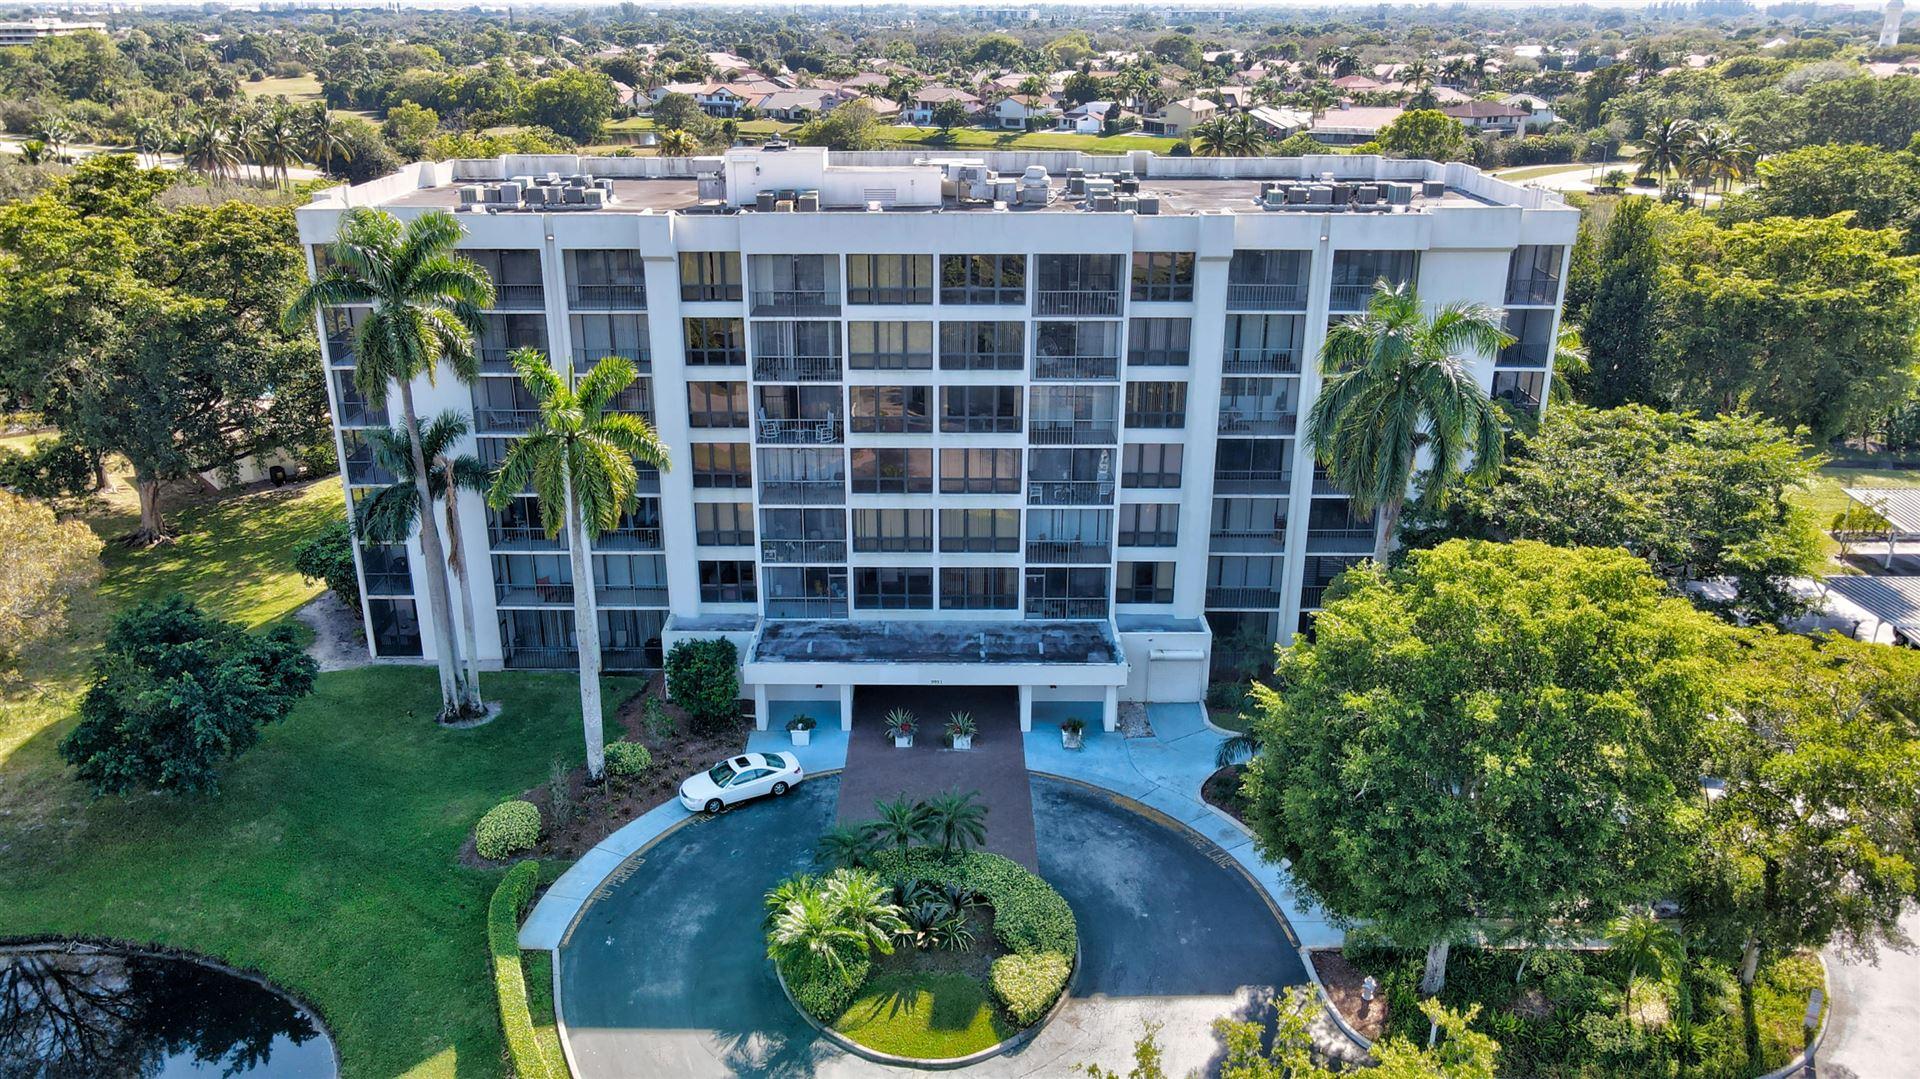 5951 Wellesley Park Drive #502, Boca Raton, FL 33433 - #: RX-10686690